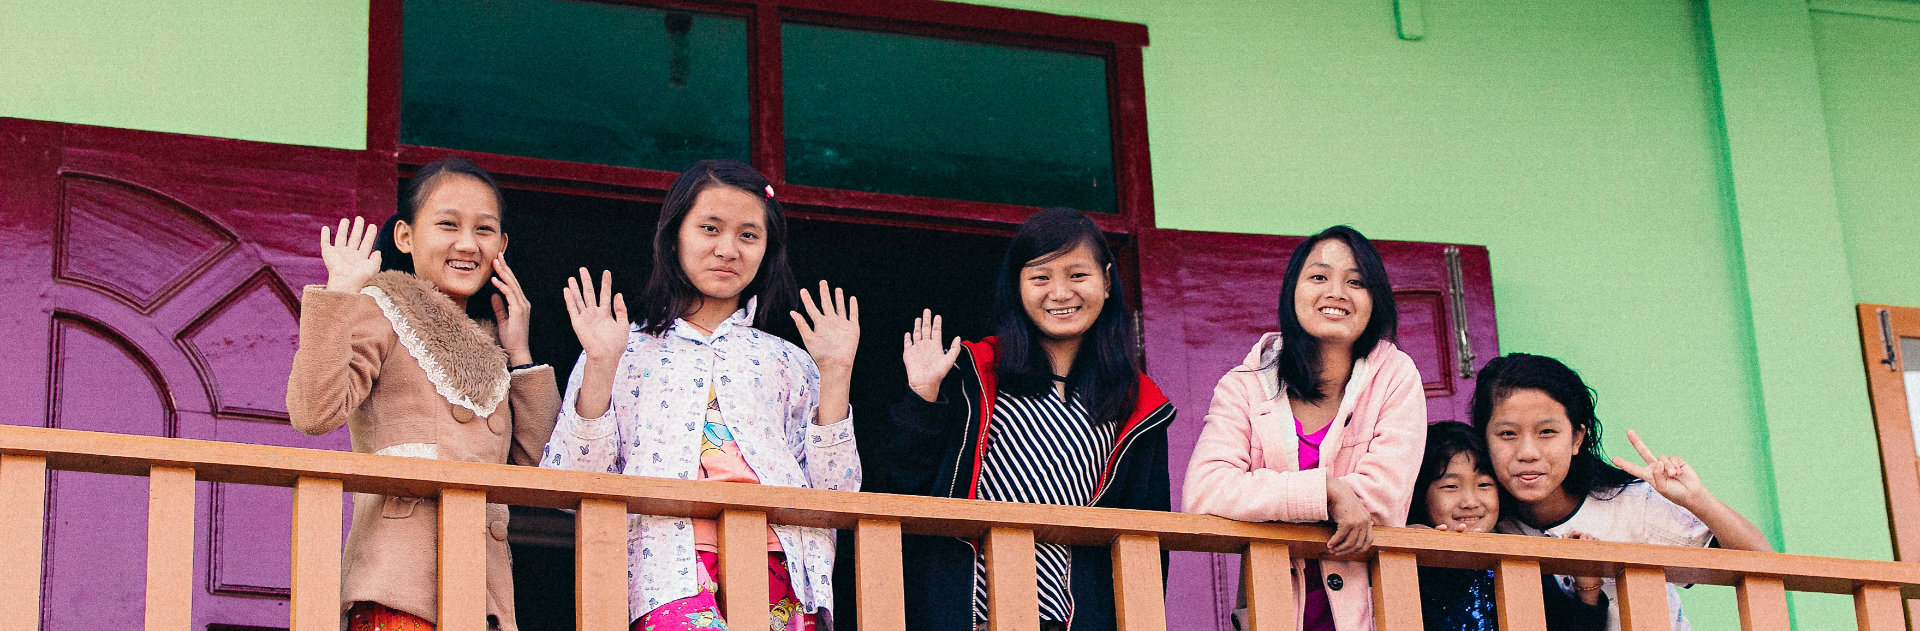 Girls waving on a balcony